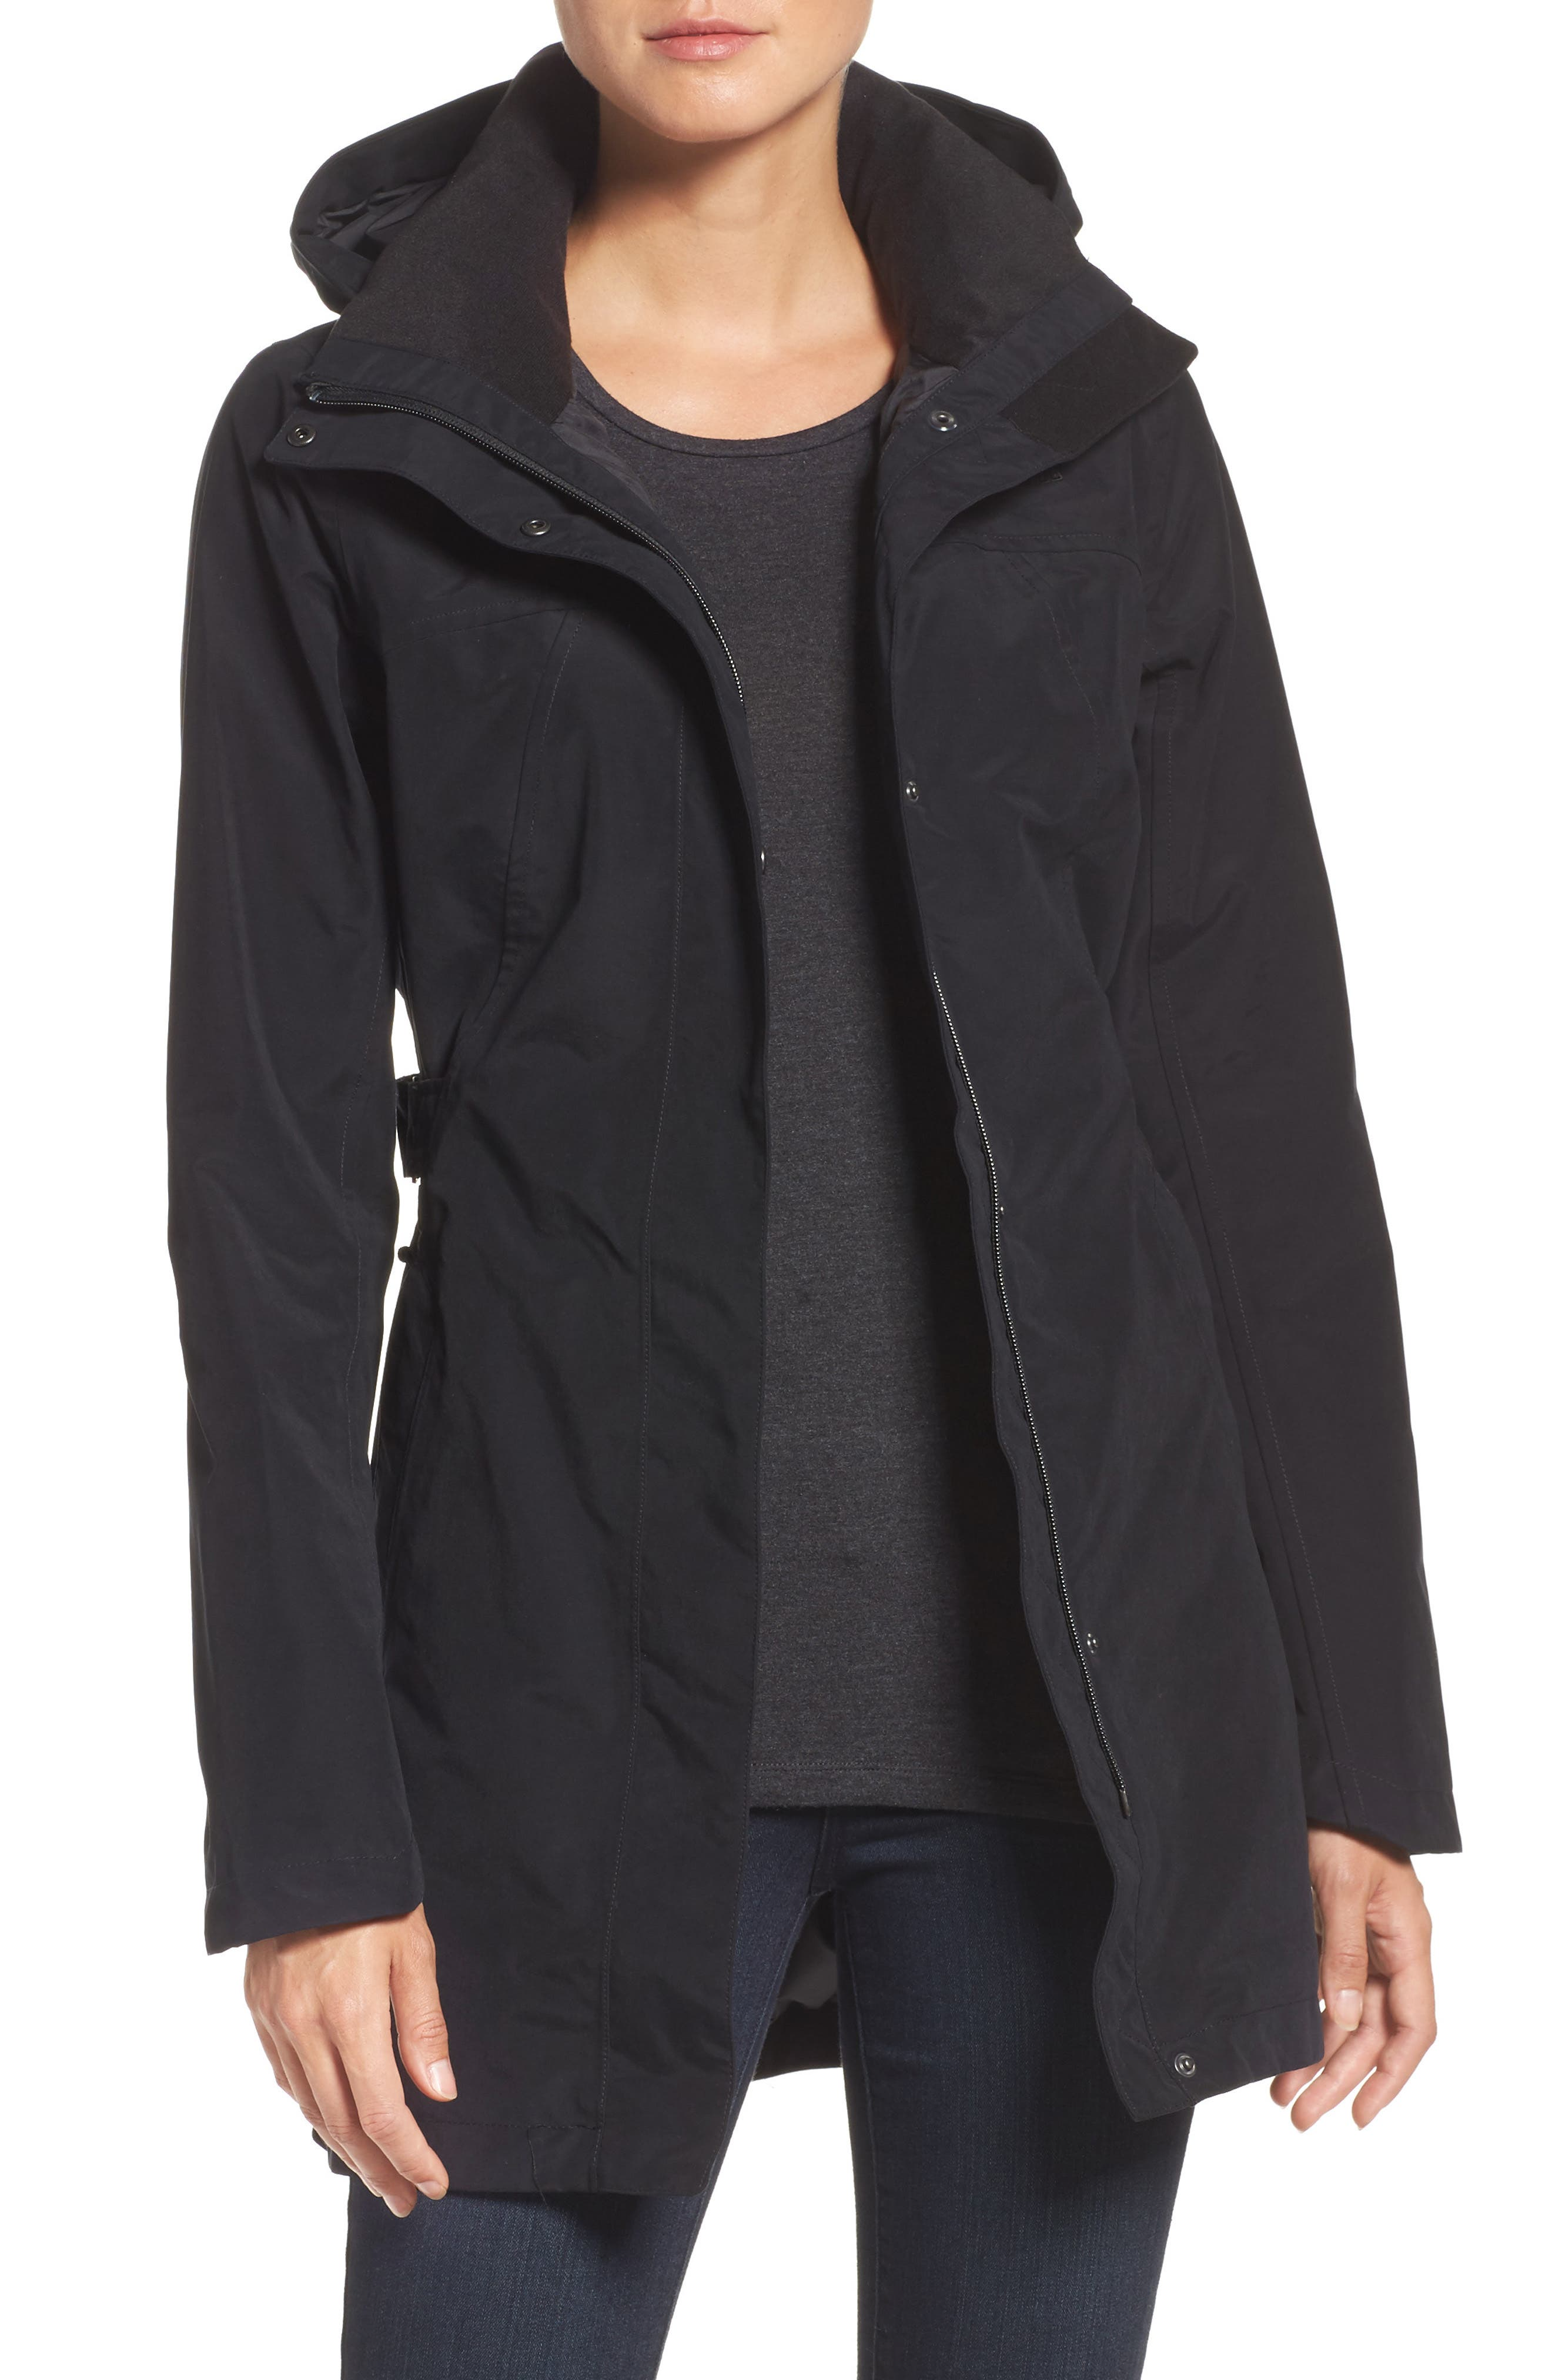 Laney II Trench Raincoat,                         Main,                         color, Tnf Black